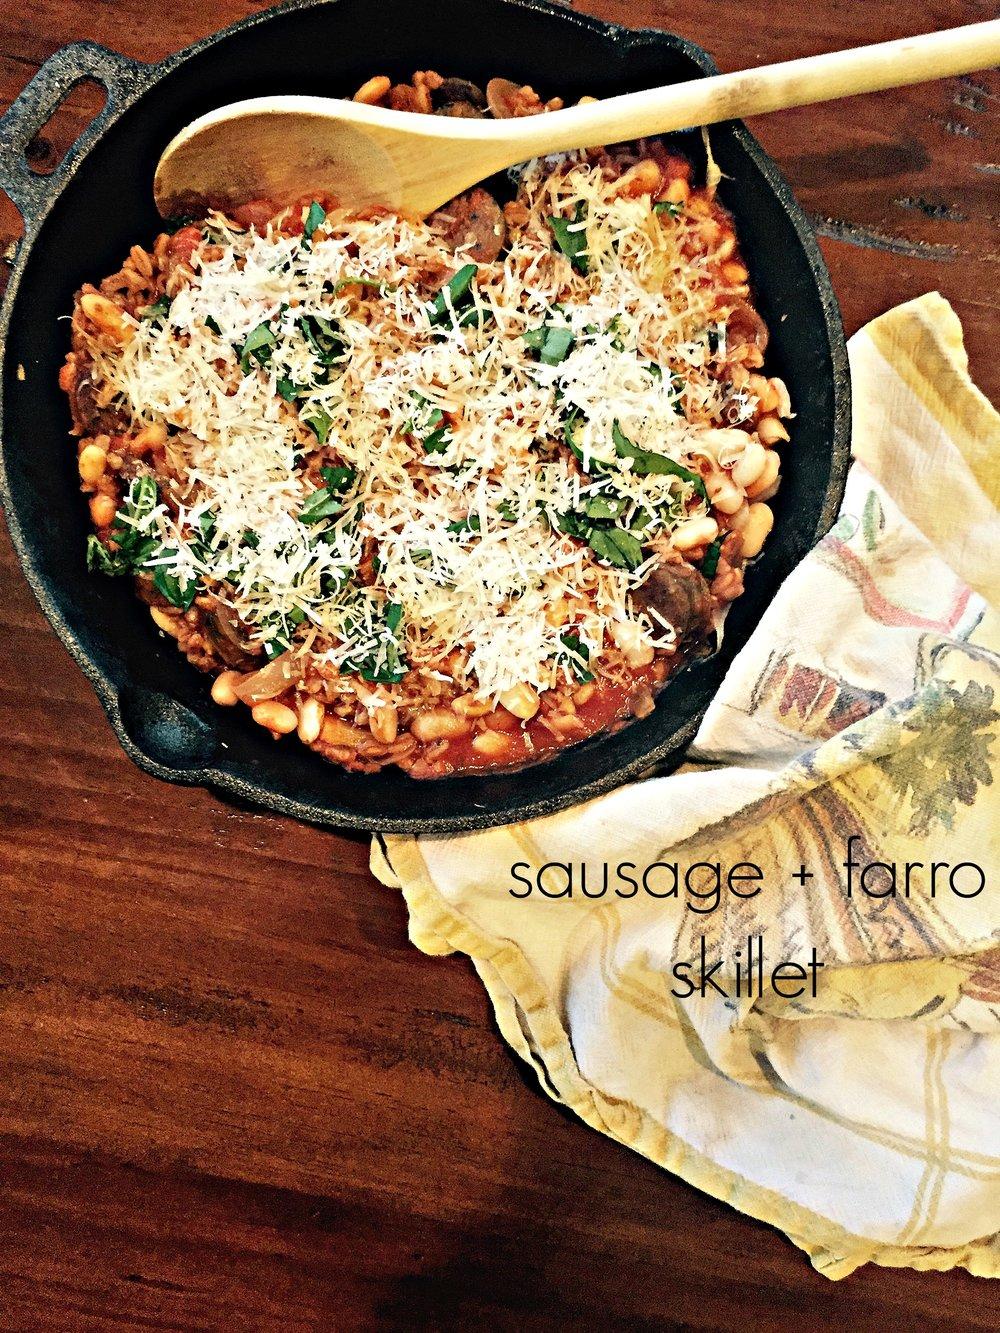 Sausage-Farro-Skillet-2.jpg